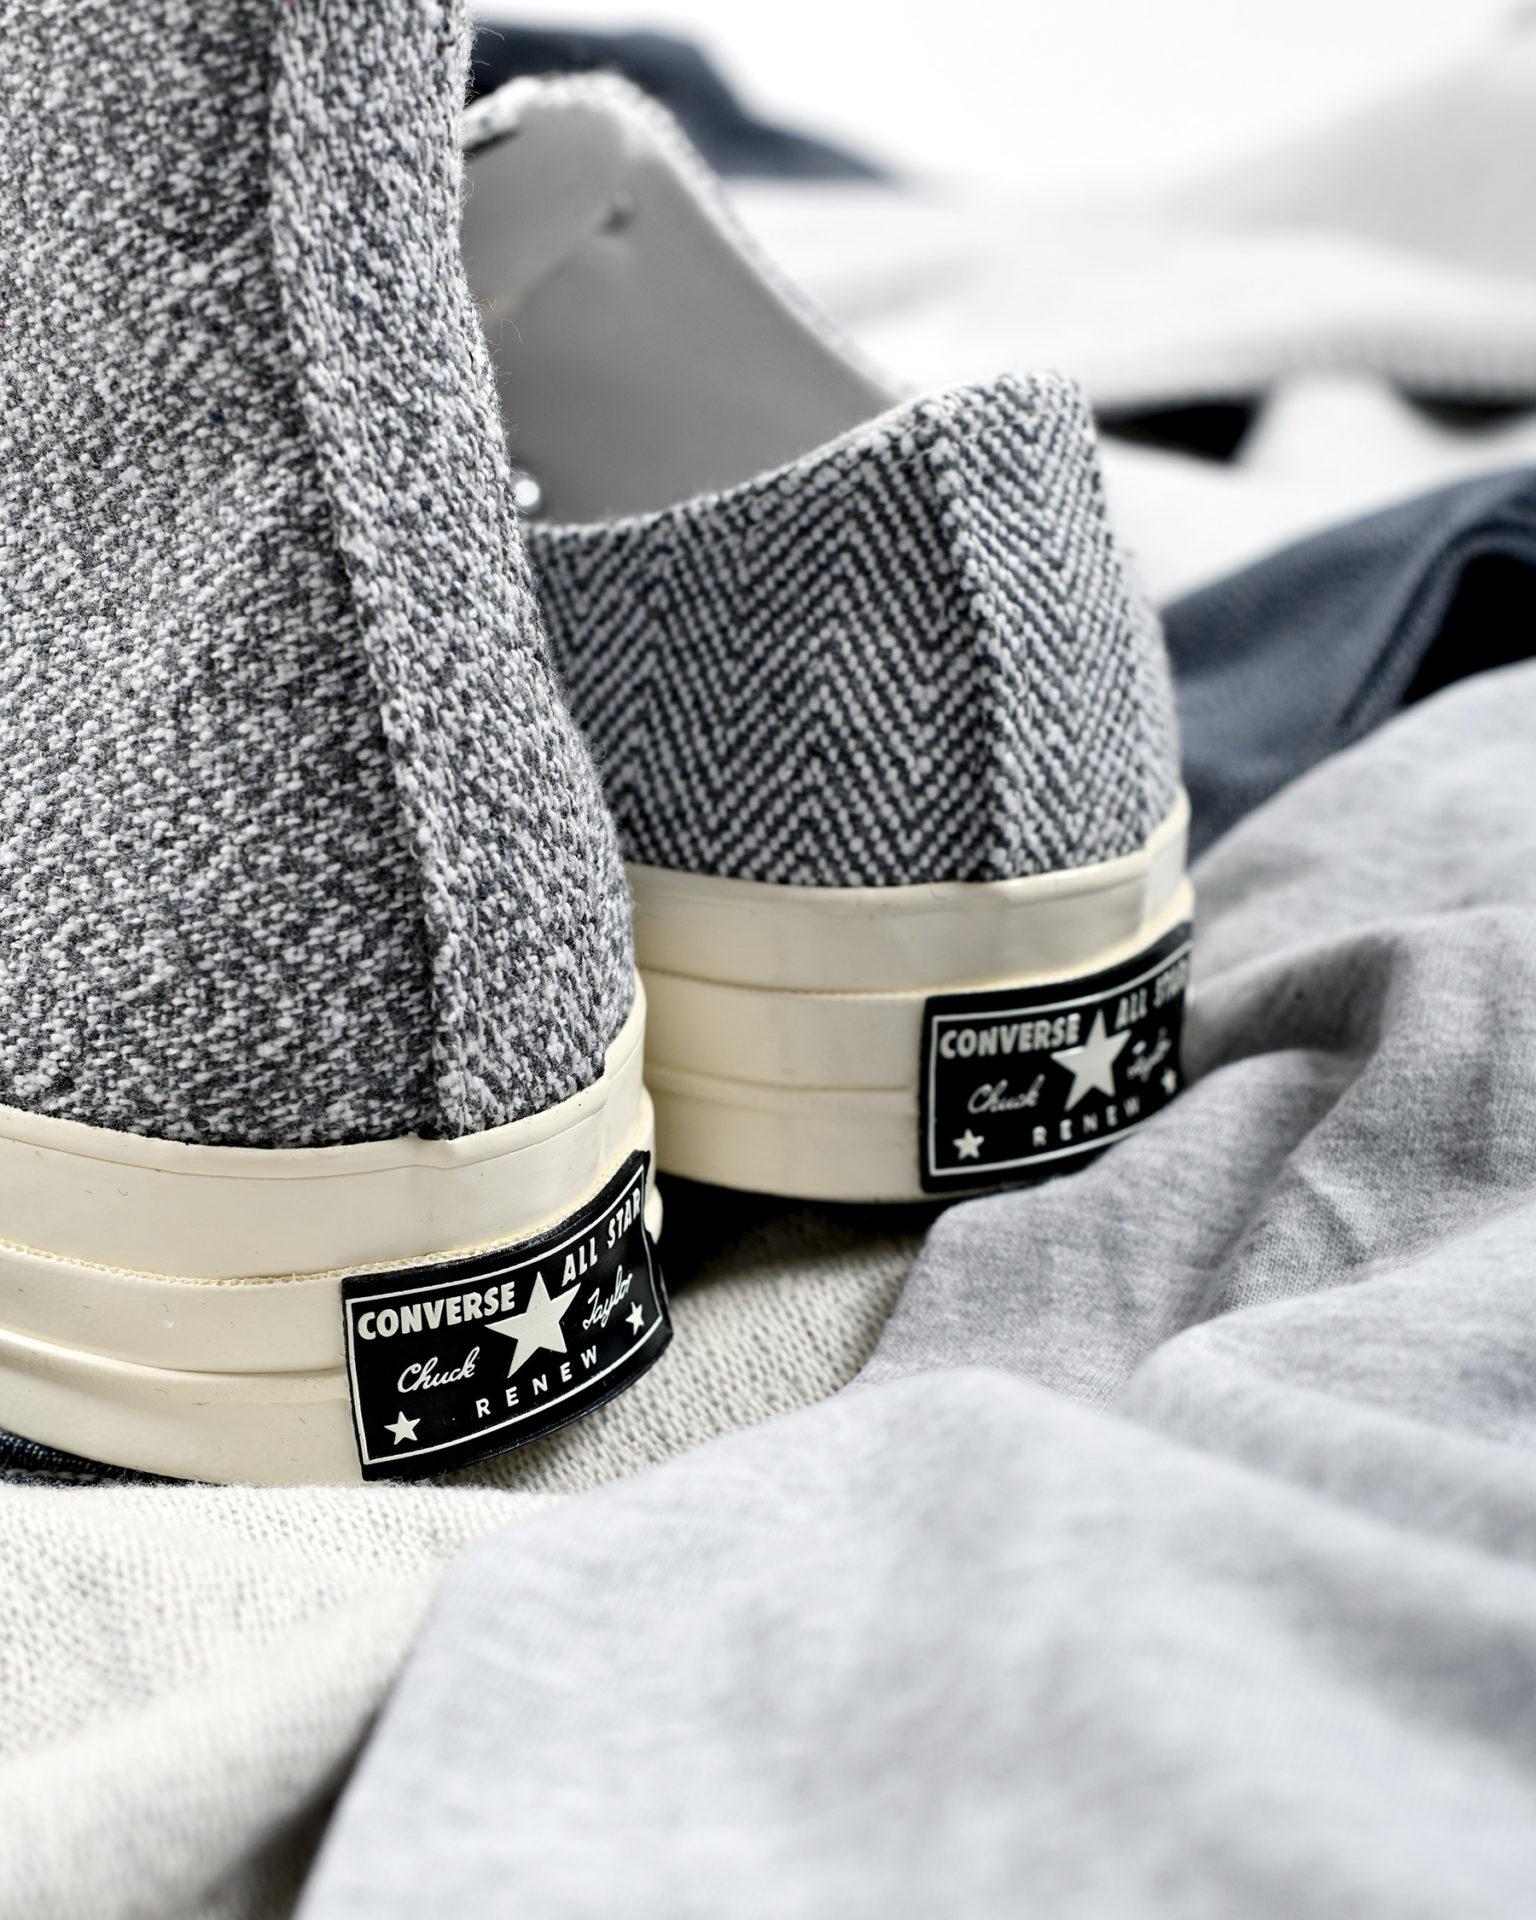 Converse Chuck 70 « Renew Cotton » Pack